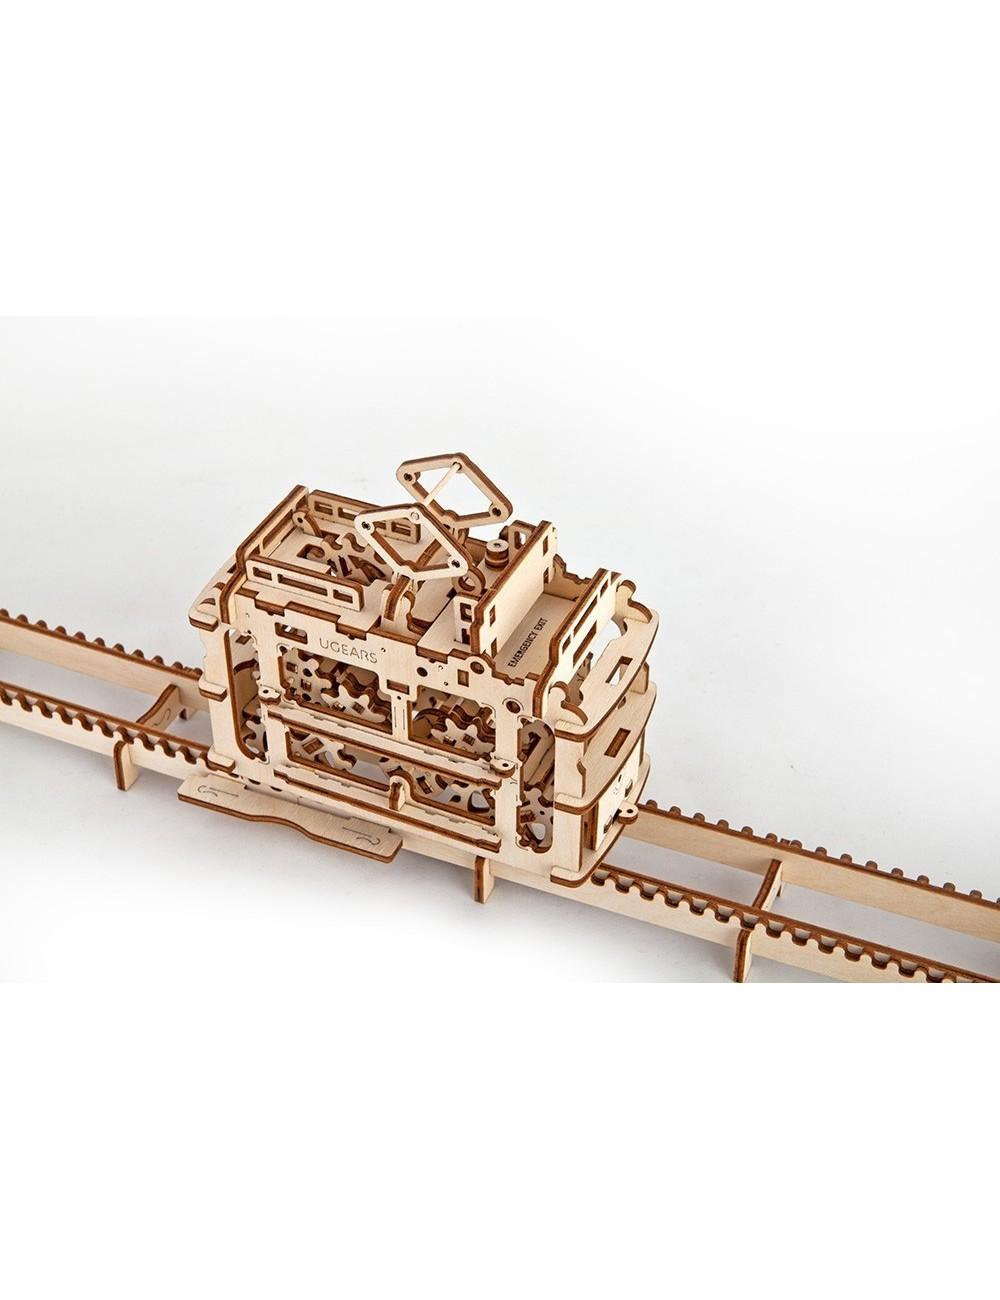 Model Tram with rails